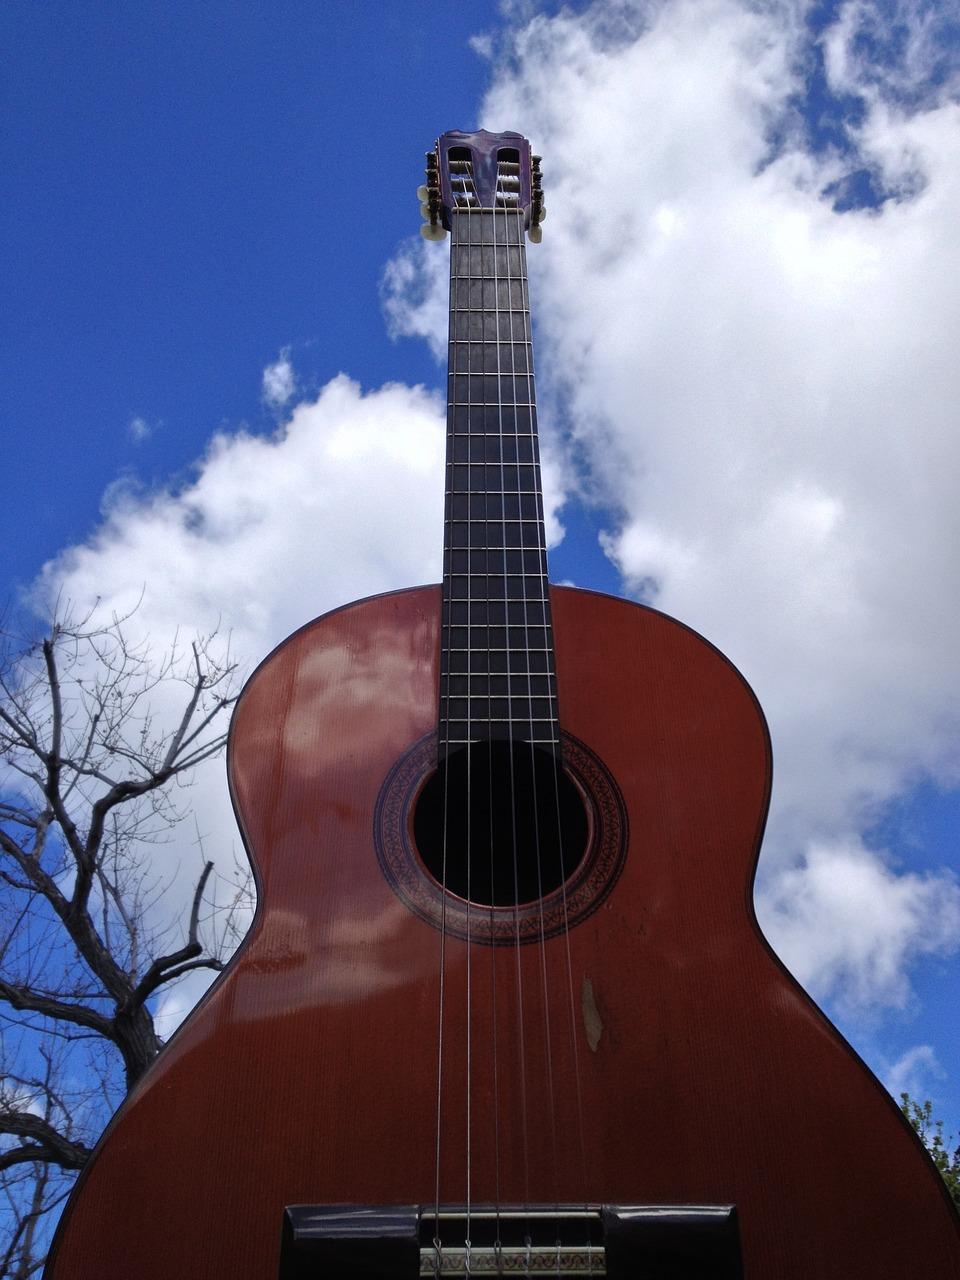 про гитару фото дни, когда